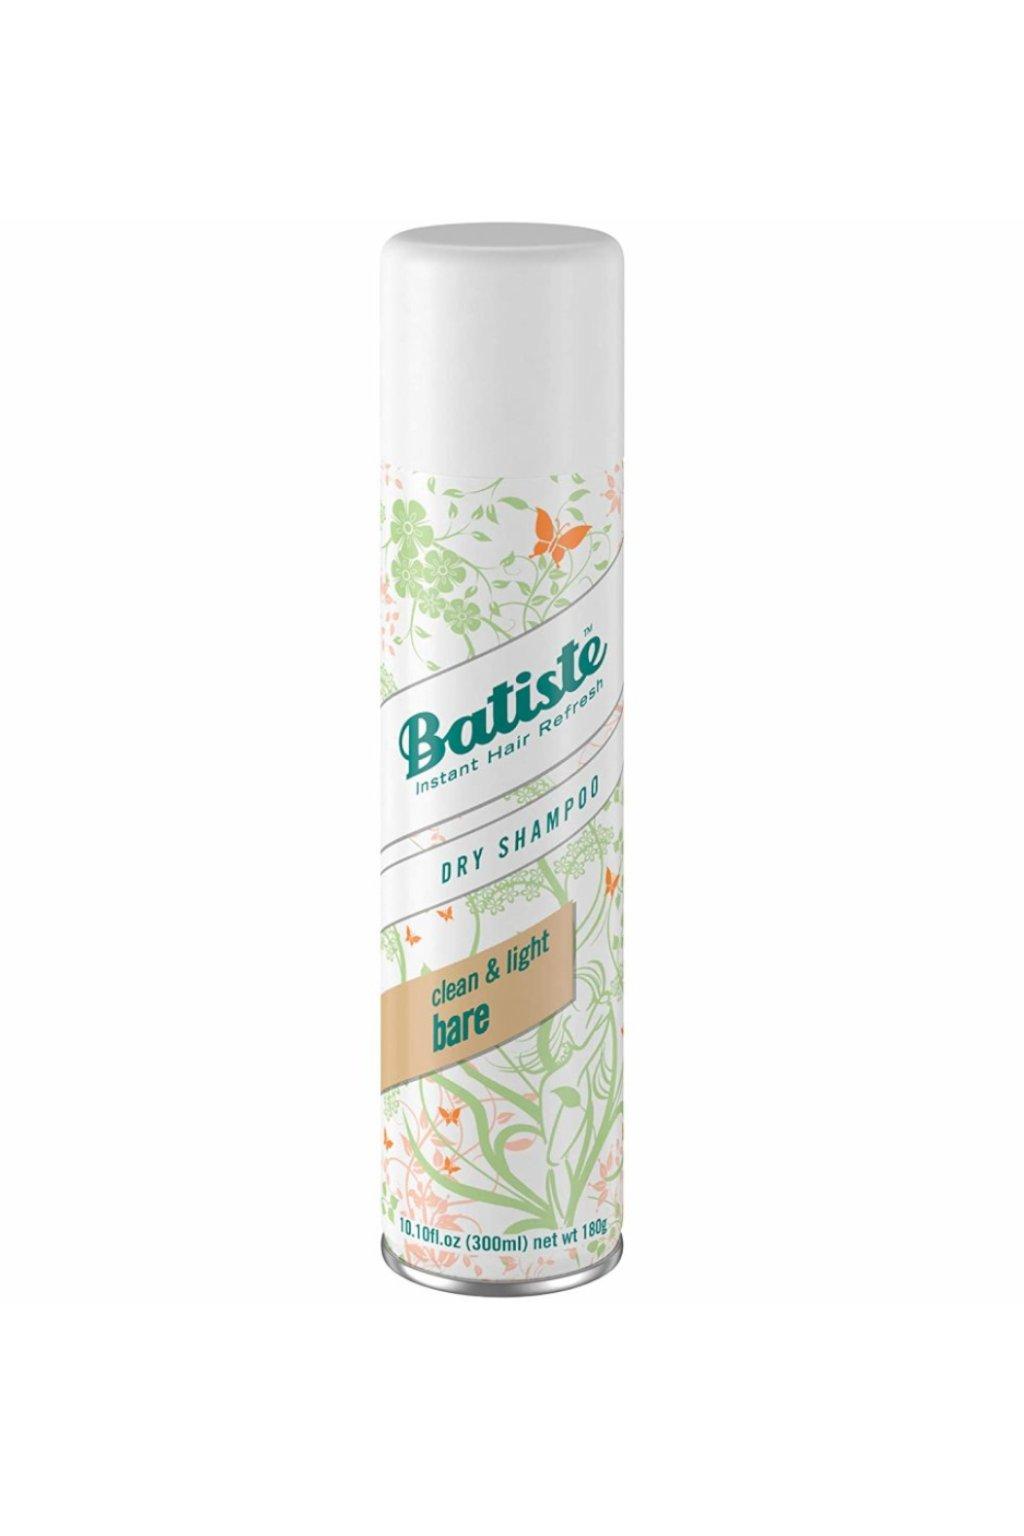 Batiste Dry Shampoo bare 1024x1364